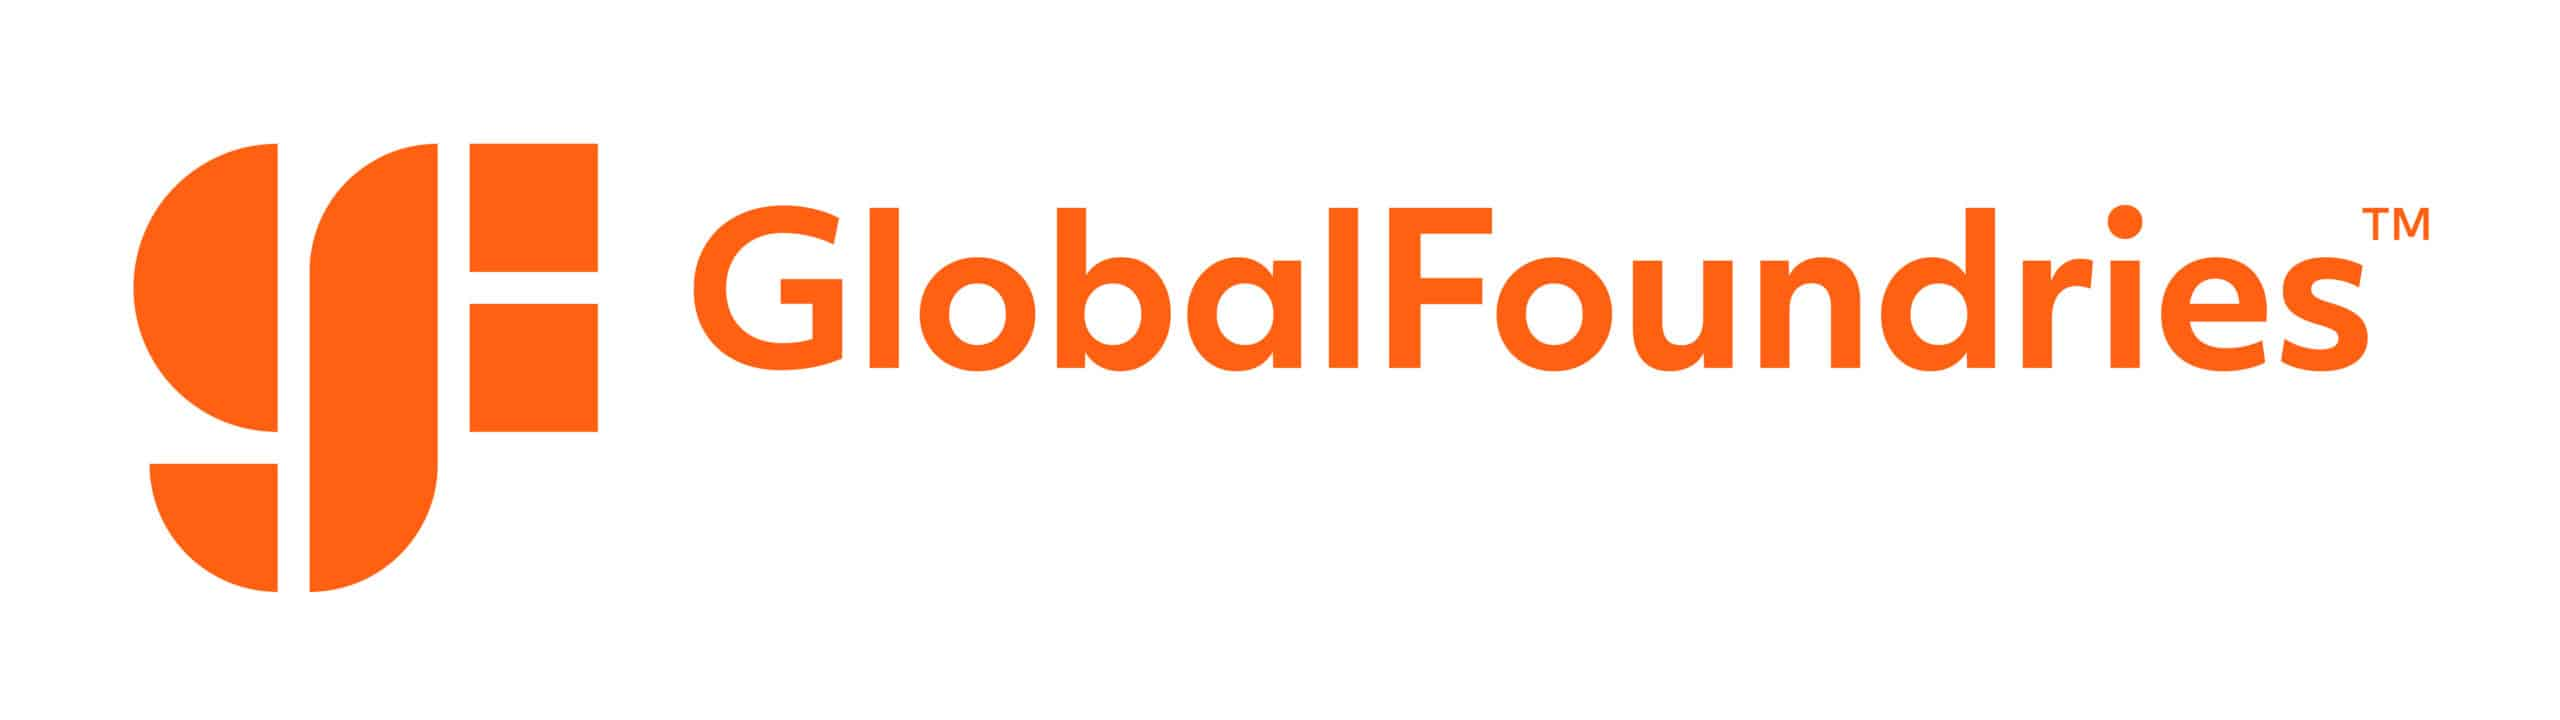 GLOBALFOUNDRIES_new